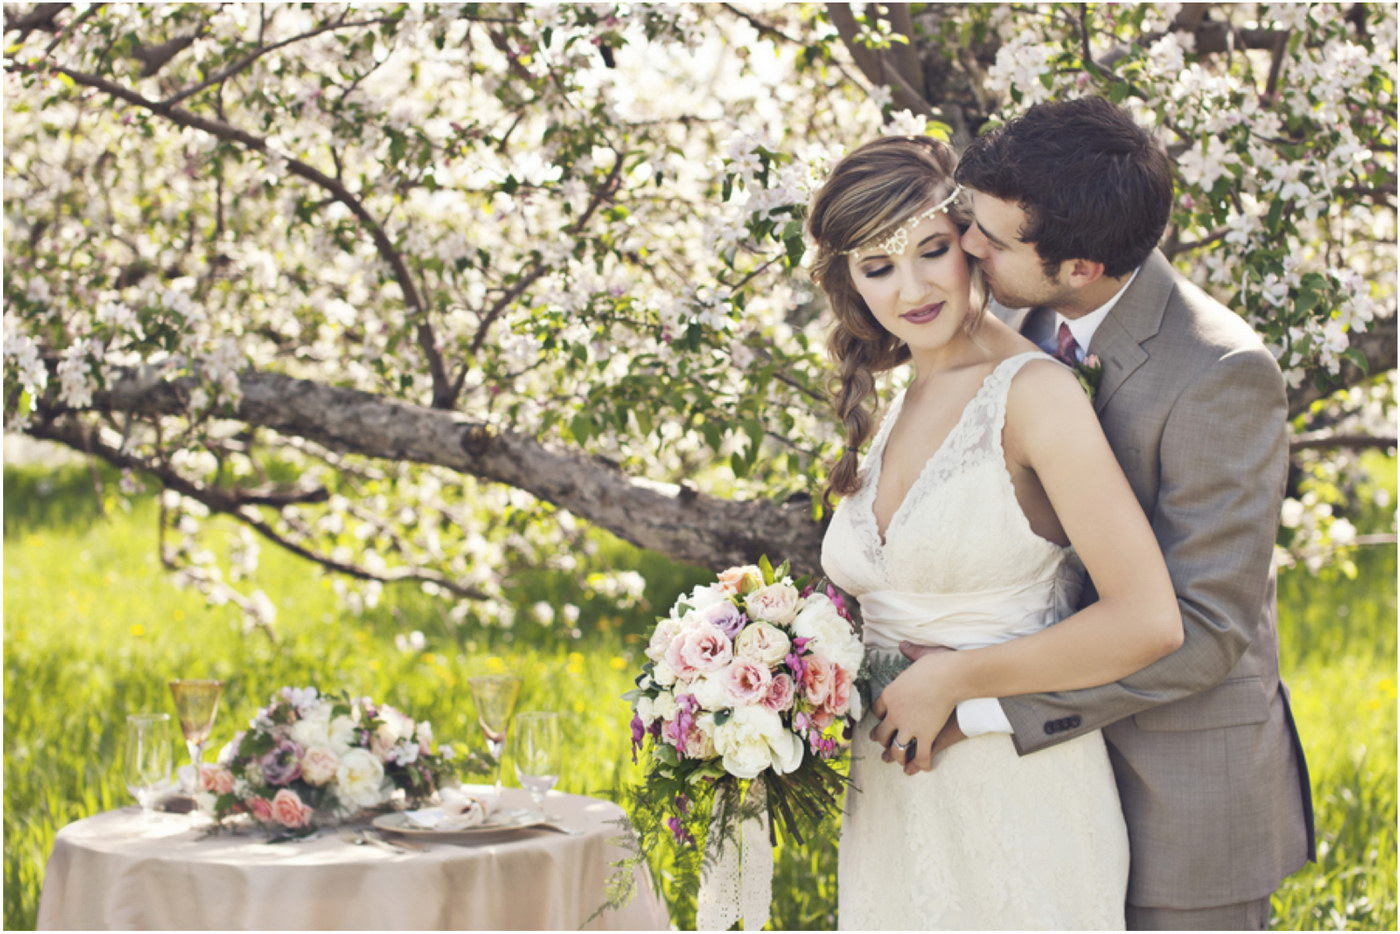 Fotografii de nunta facute primavara